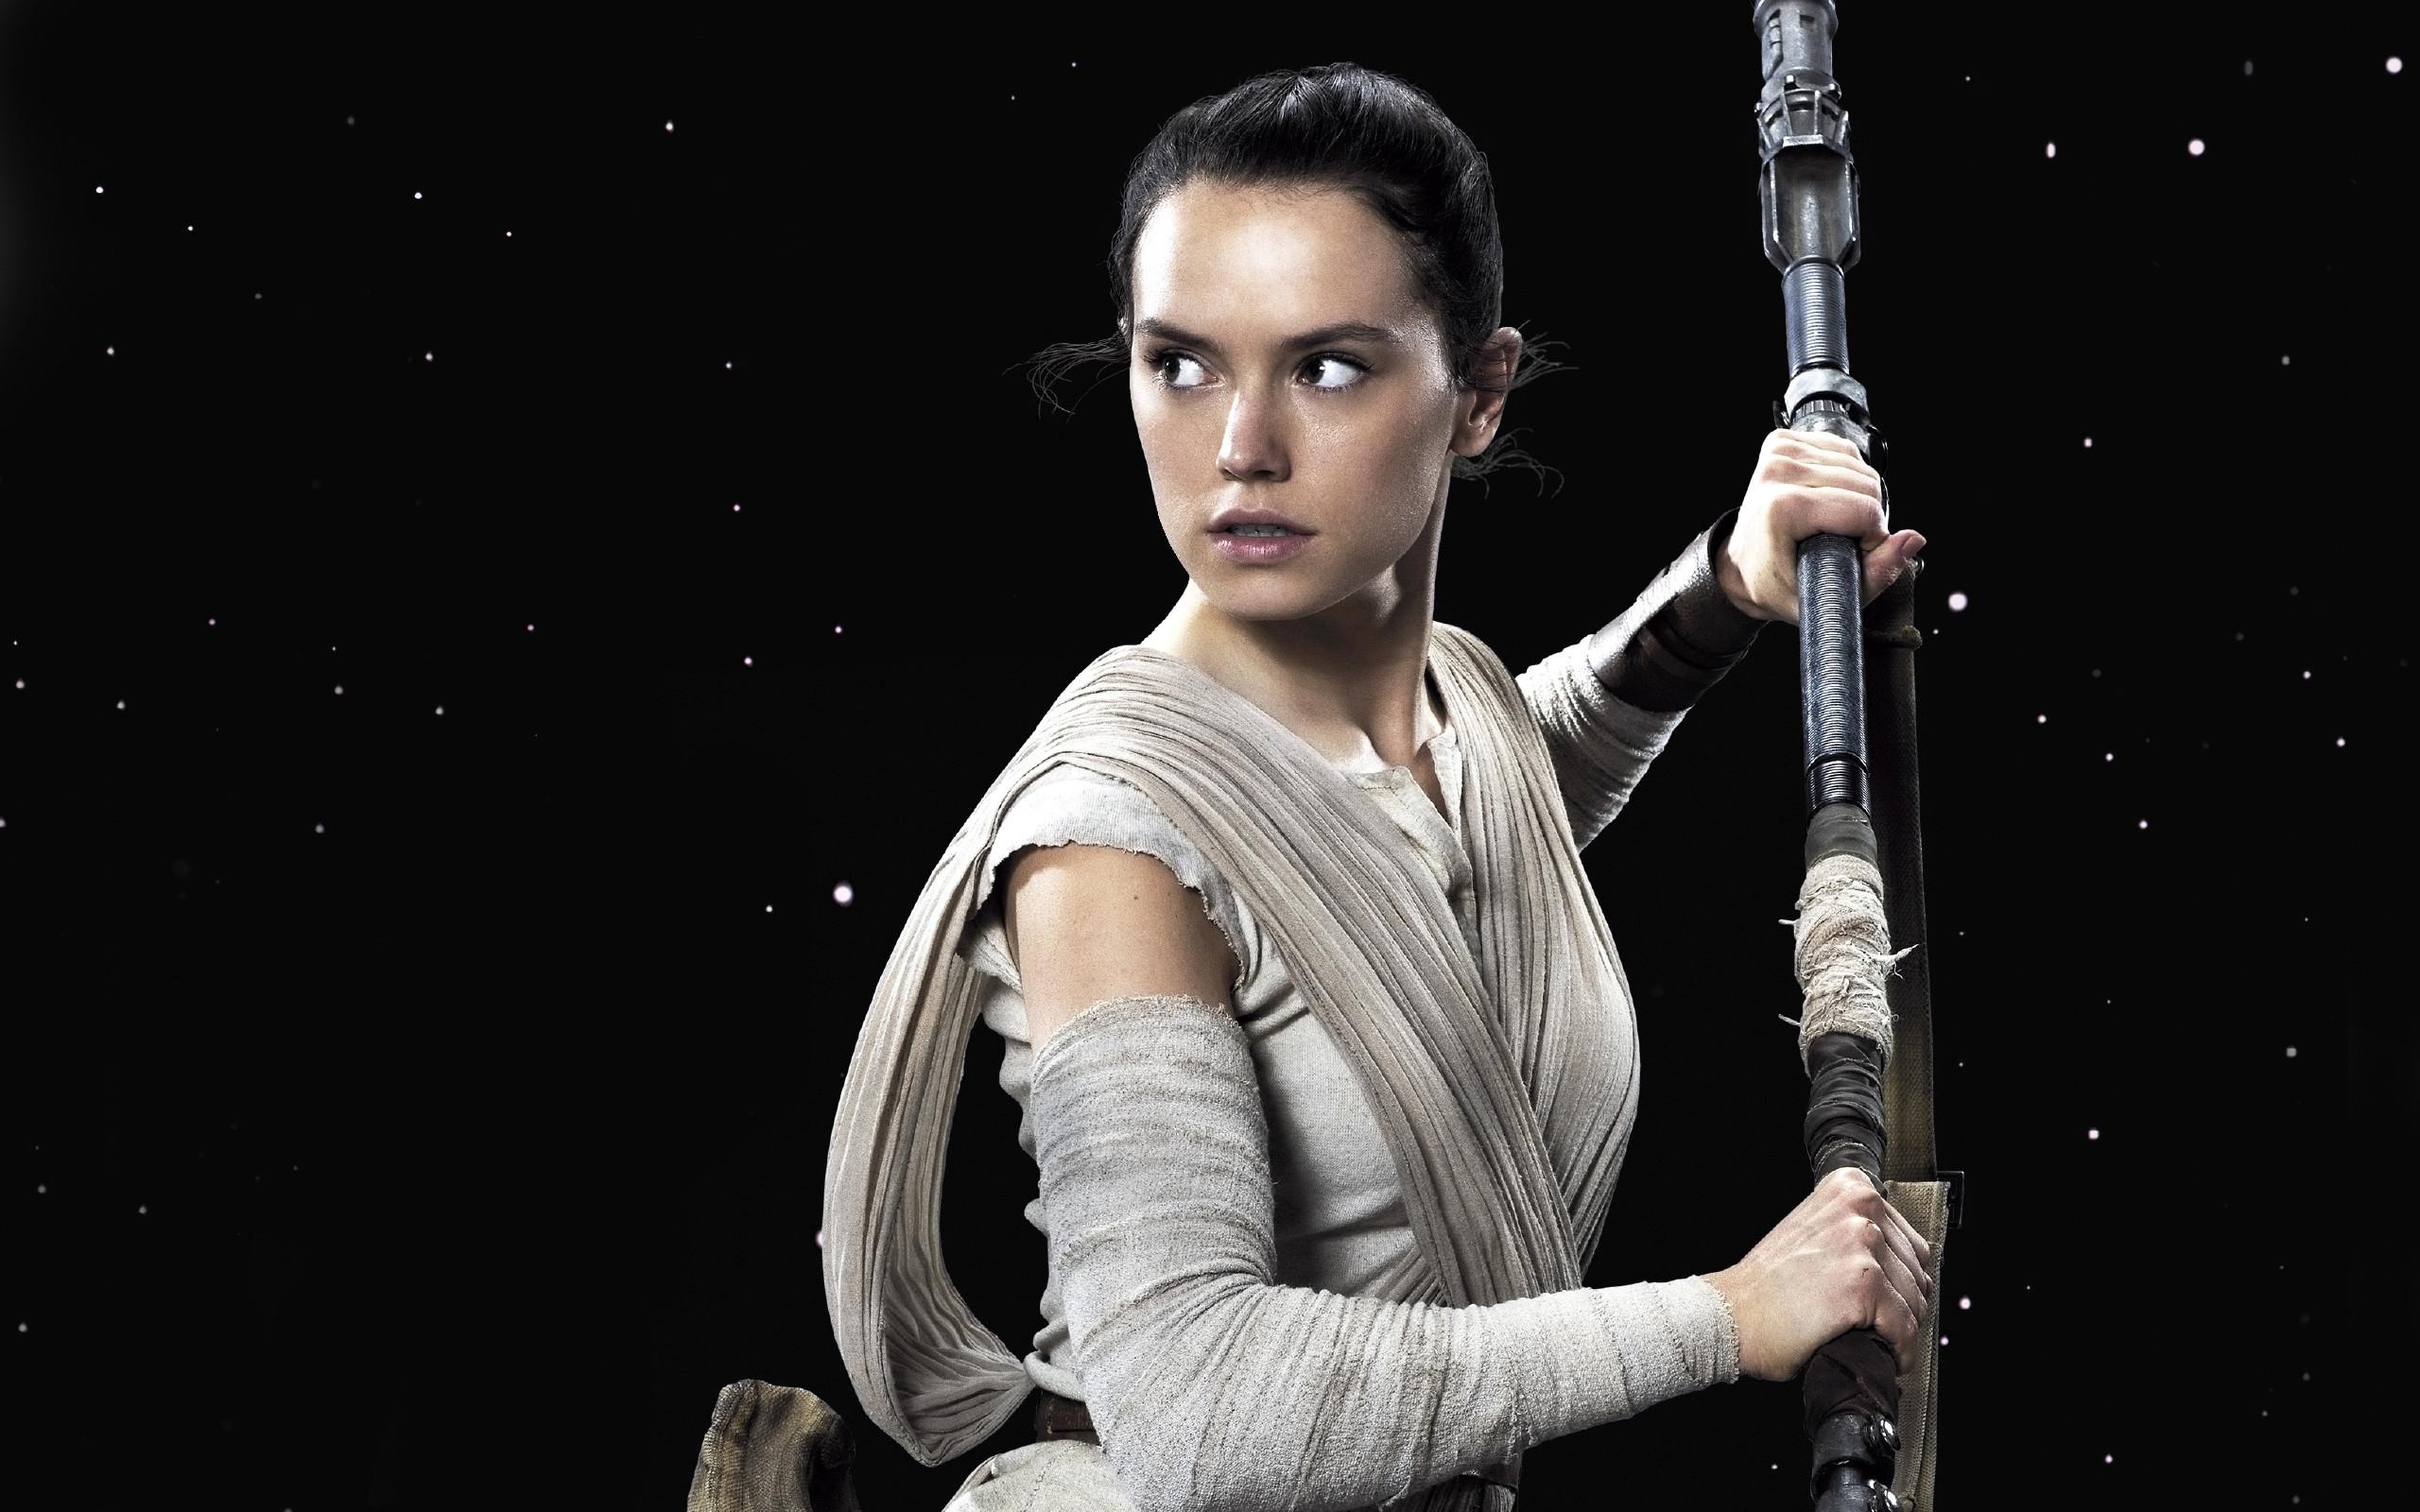 daisy ridley rey star wars the force awakens wide Star Wars HD Desktop  Wallpapers for Widescreen